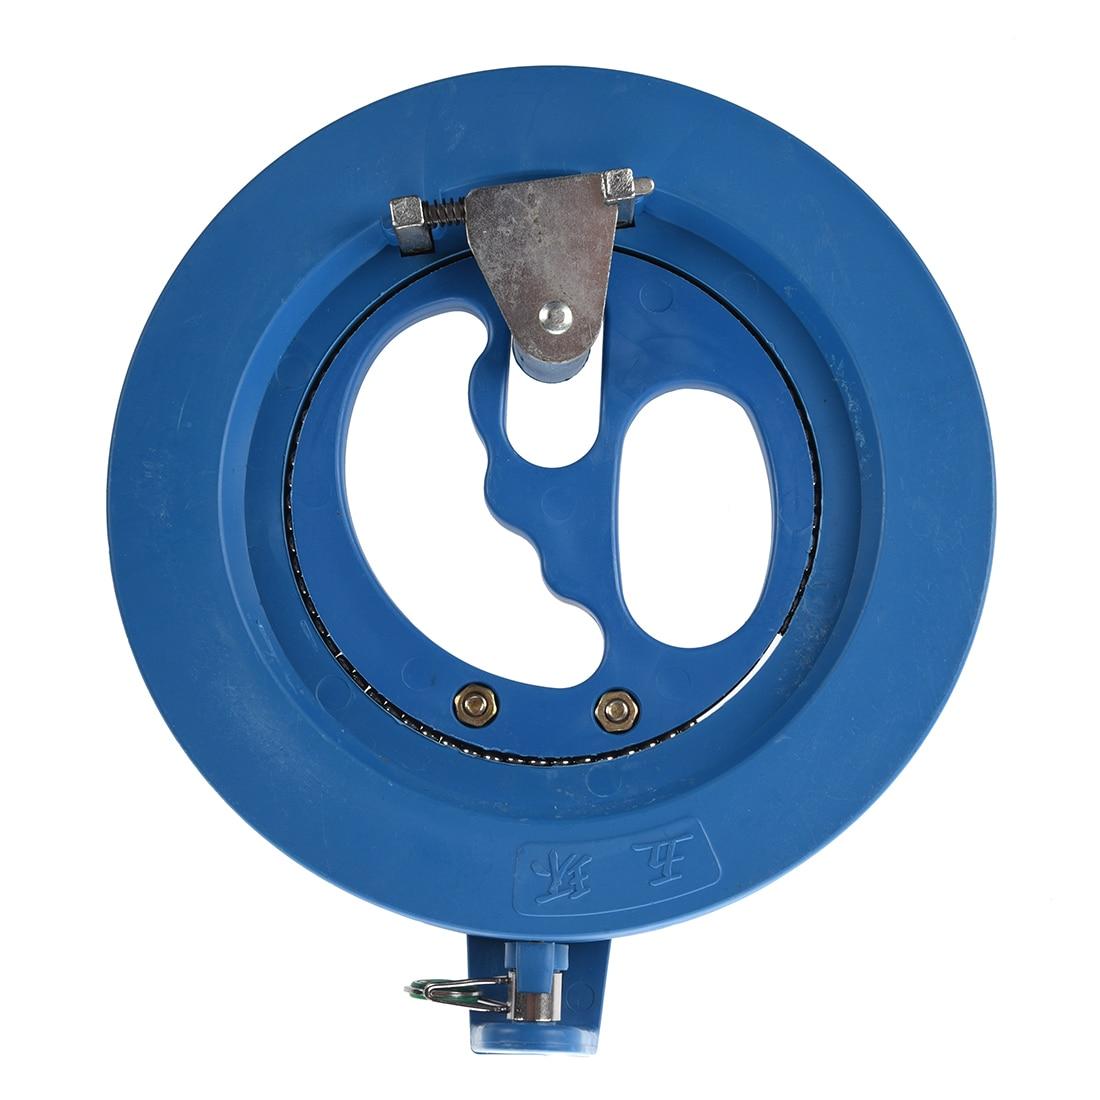 New-Blue-Outdoor-Kite-Tool-Ballbearing-Blue-Plastic-Reel-Line-Winder-2